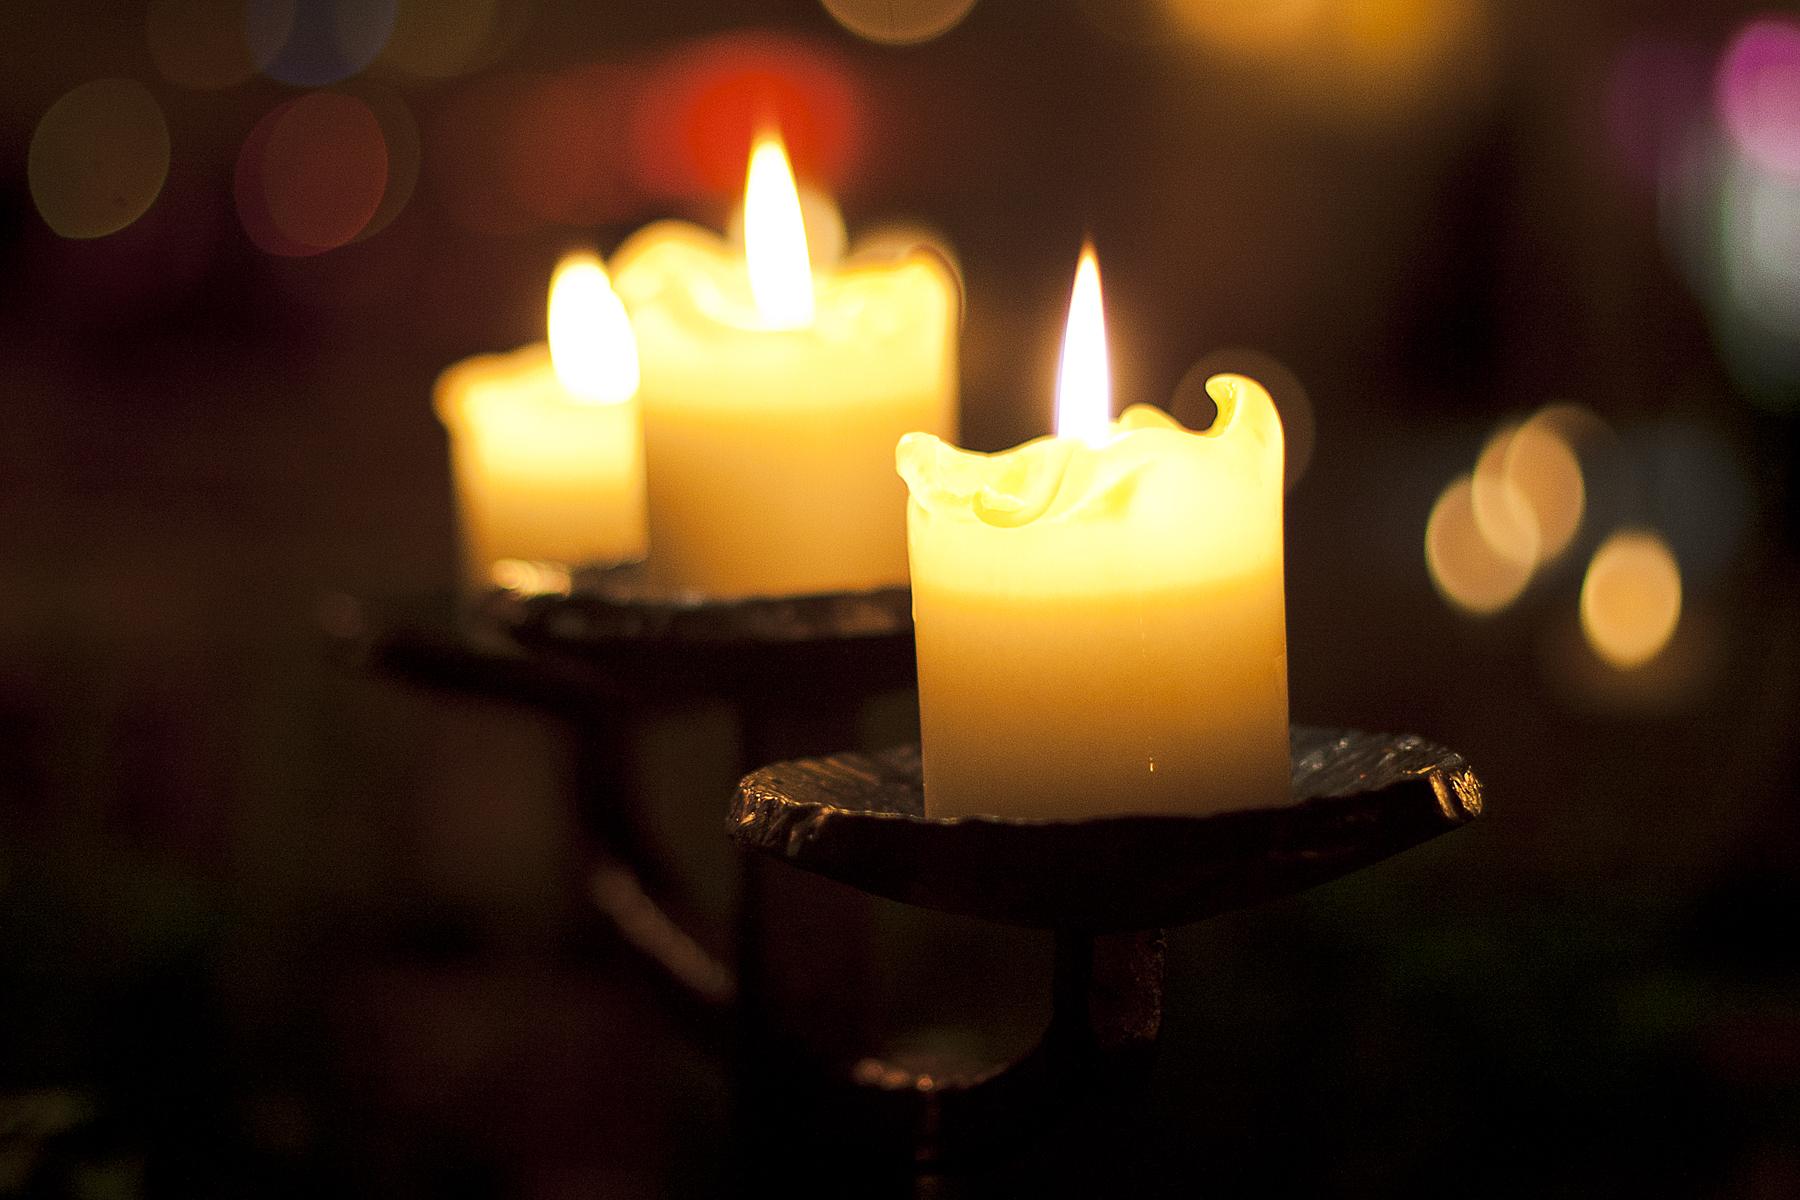 Candles Via @Atisgailis